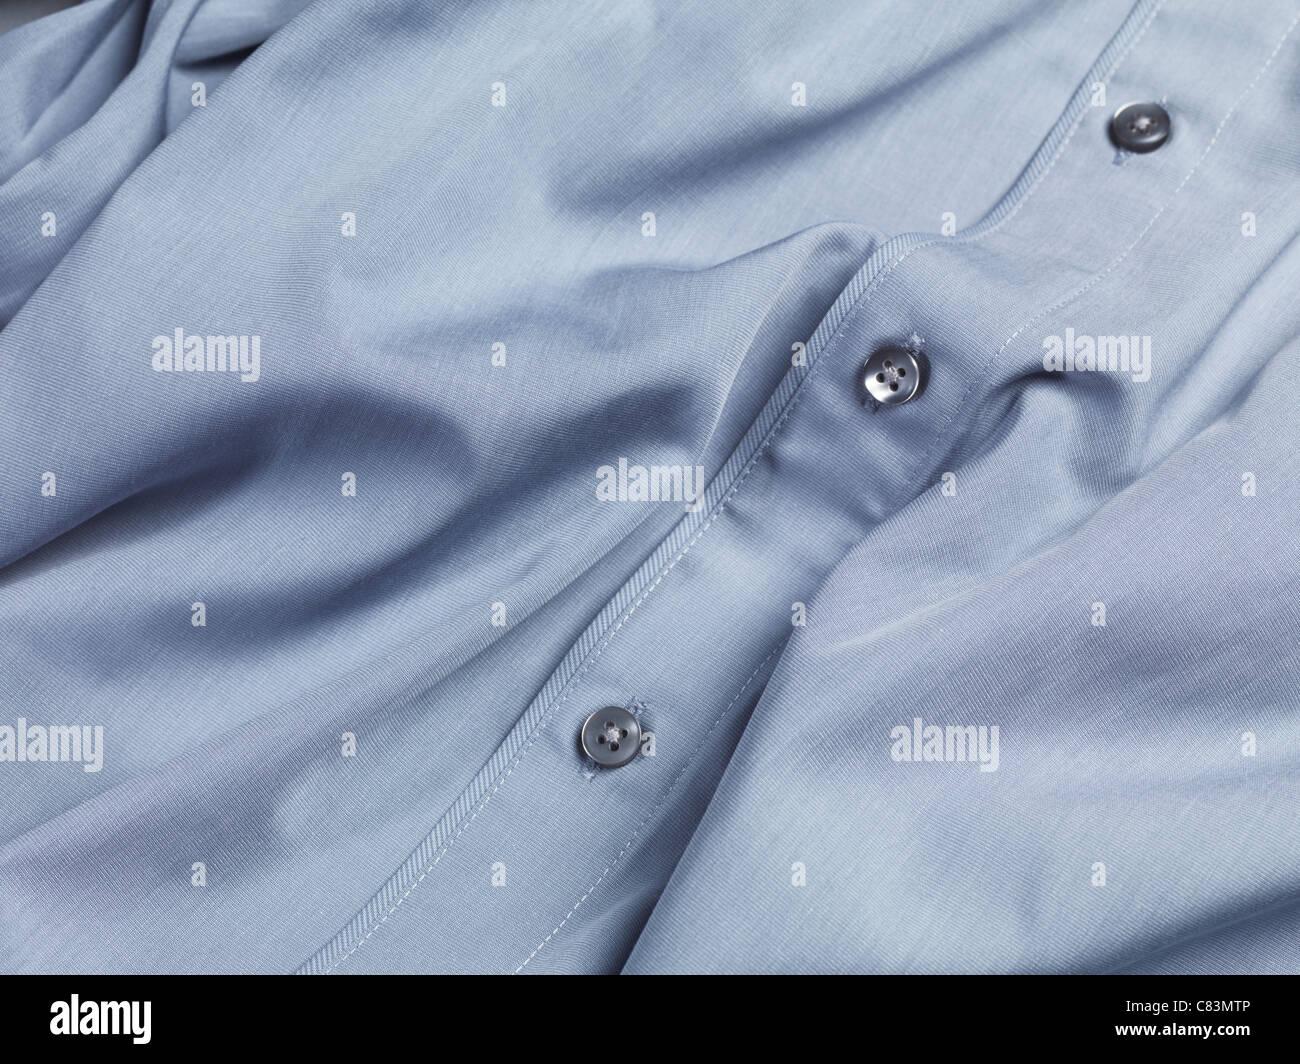 Primer plano de un mens camisa de vestir Imagen De Stock